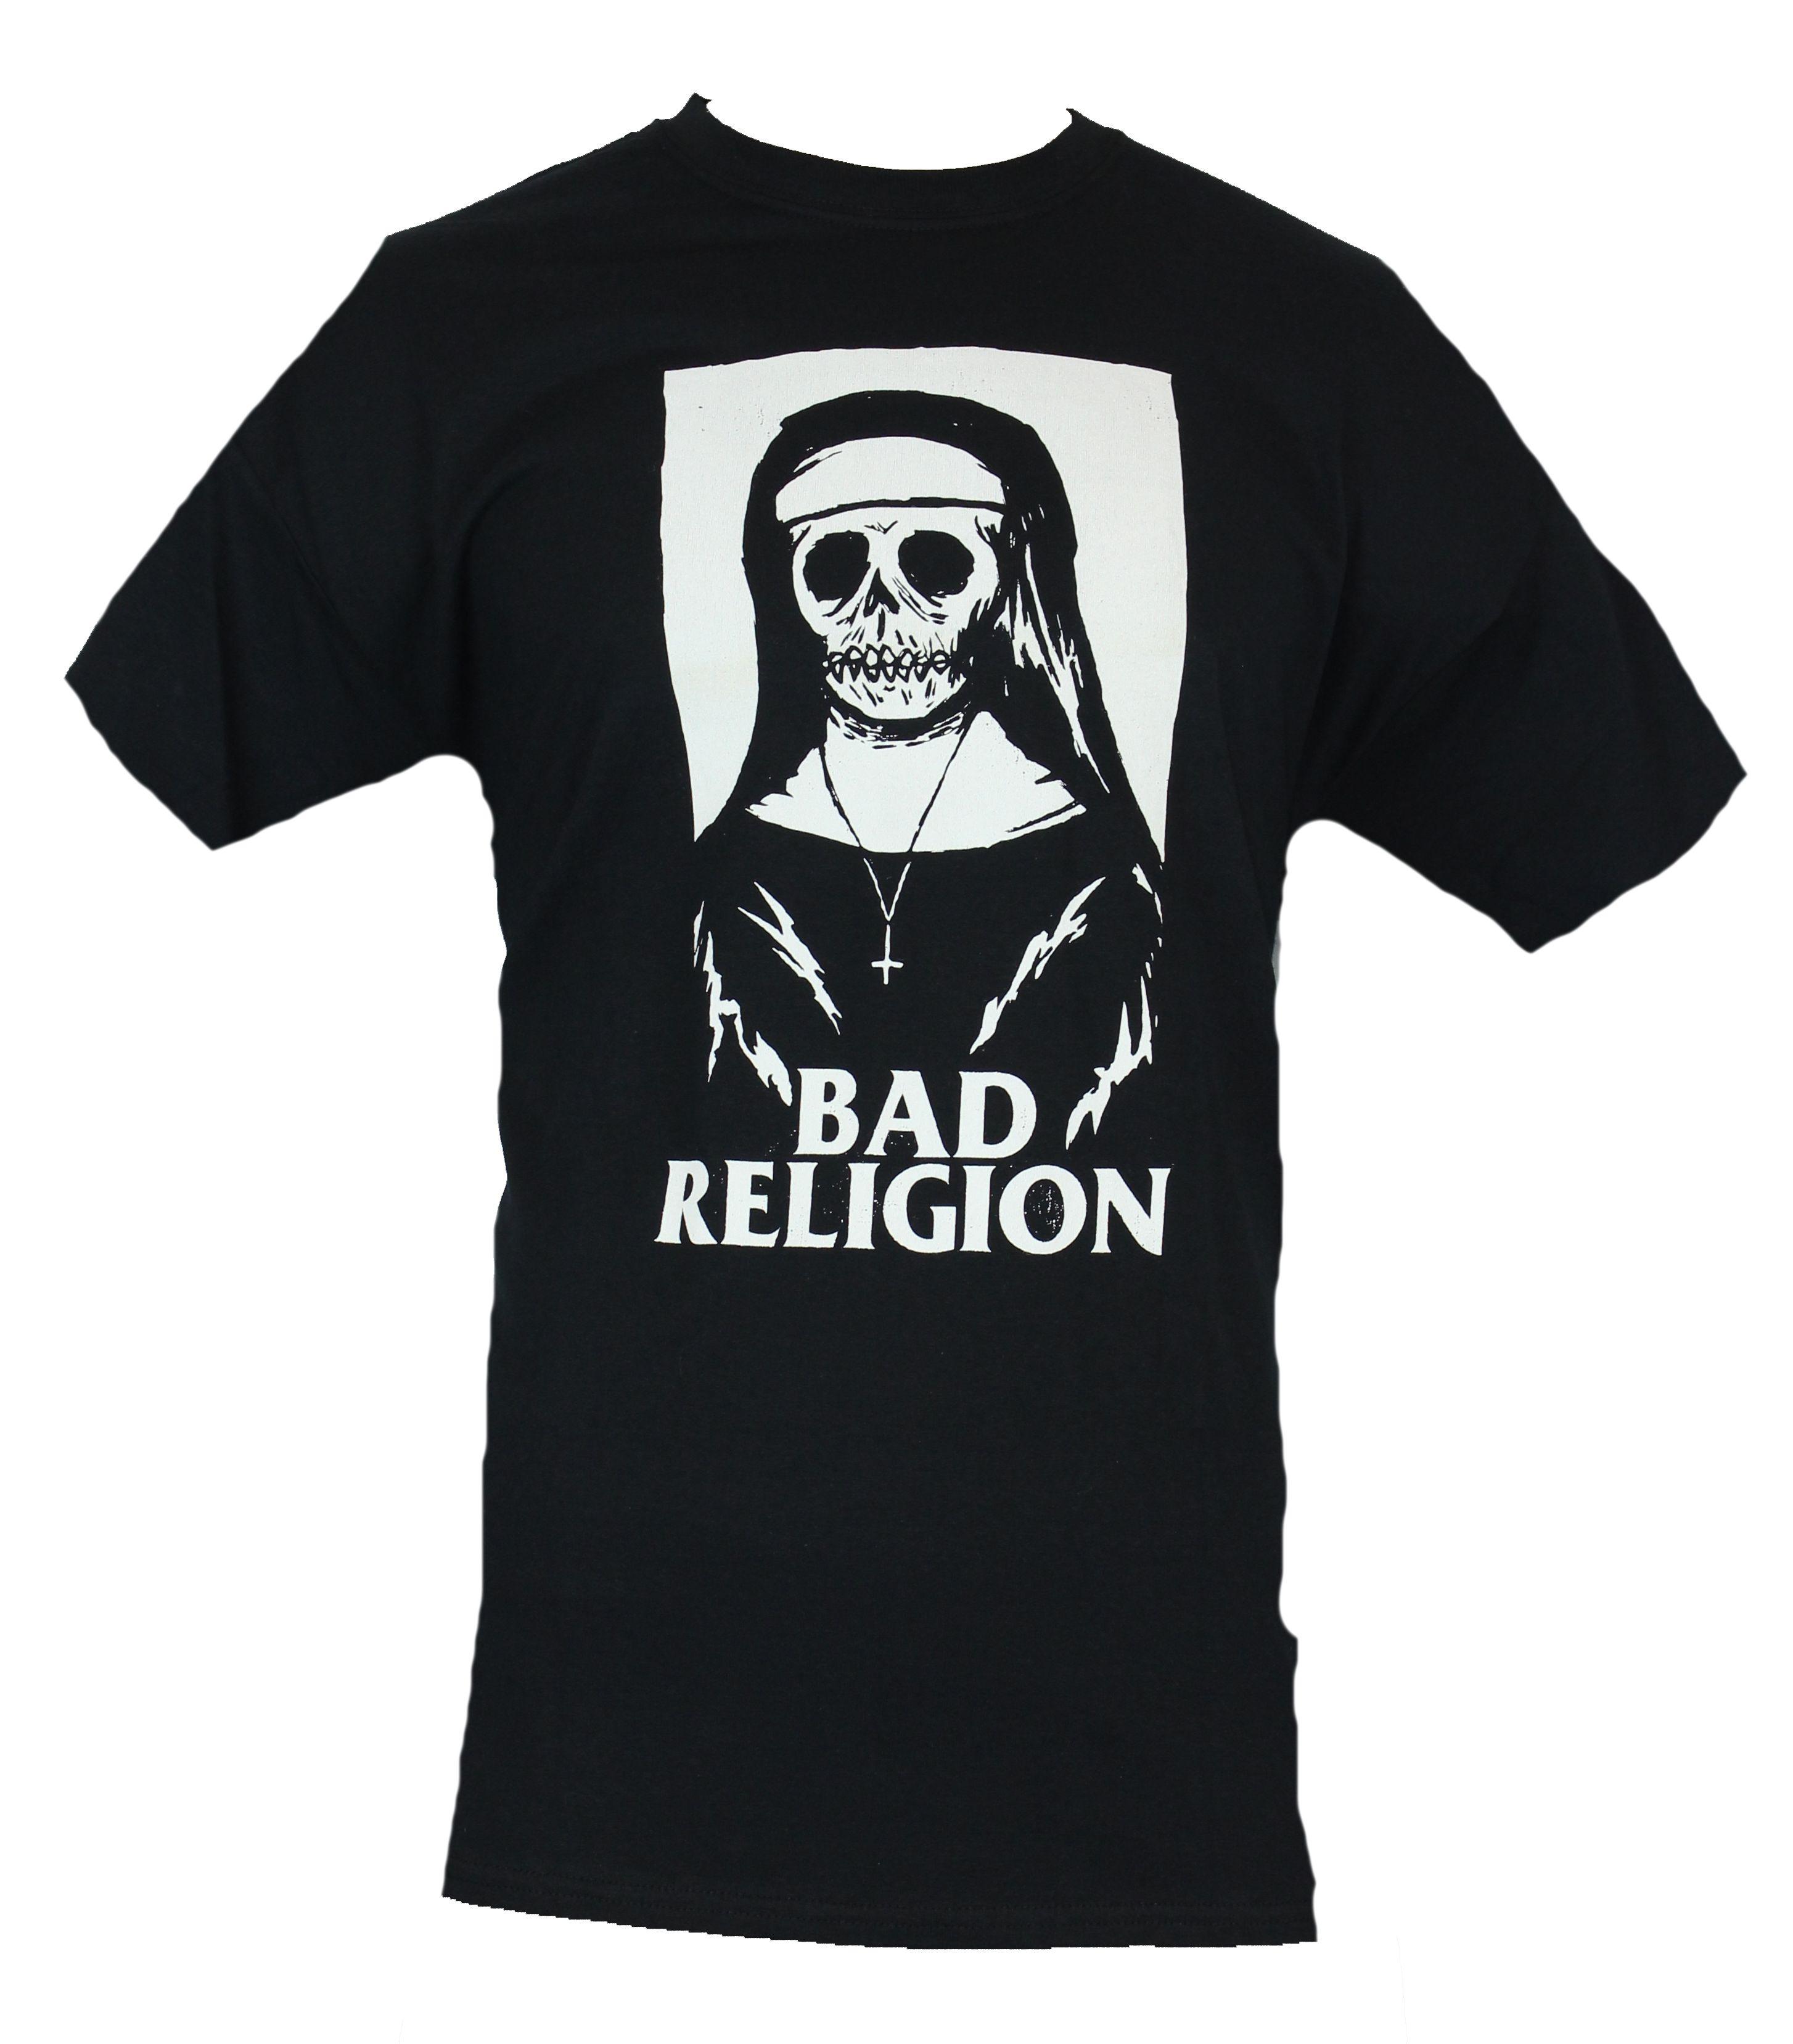 Bad religion hoodie